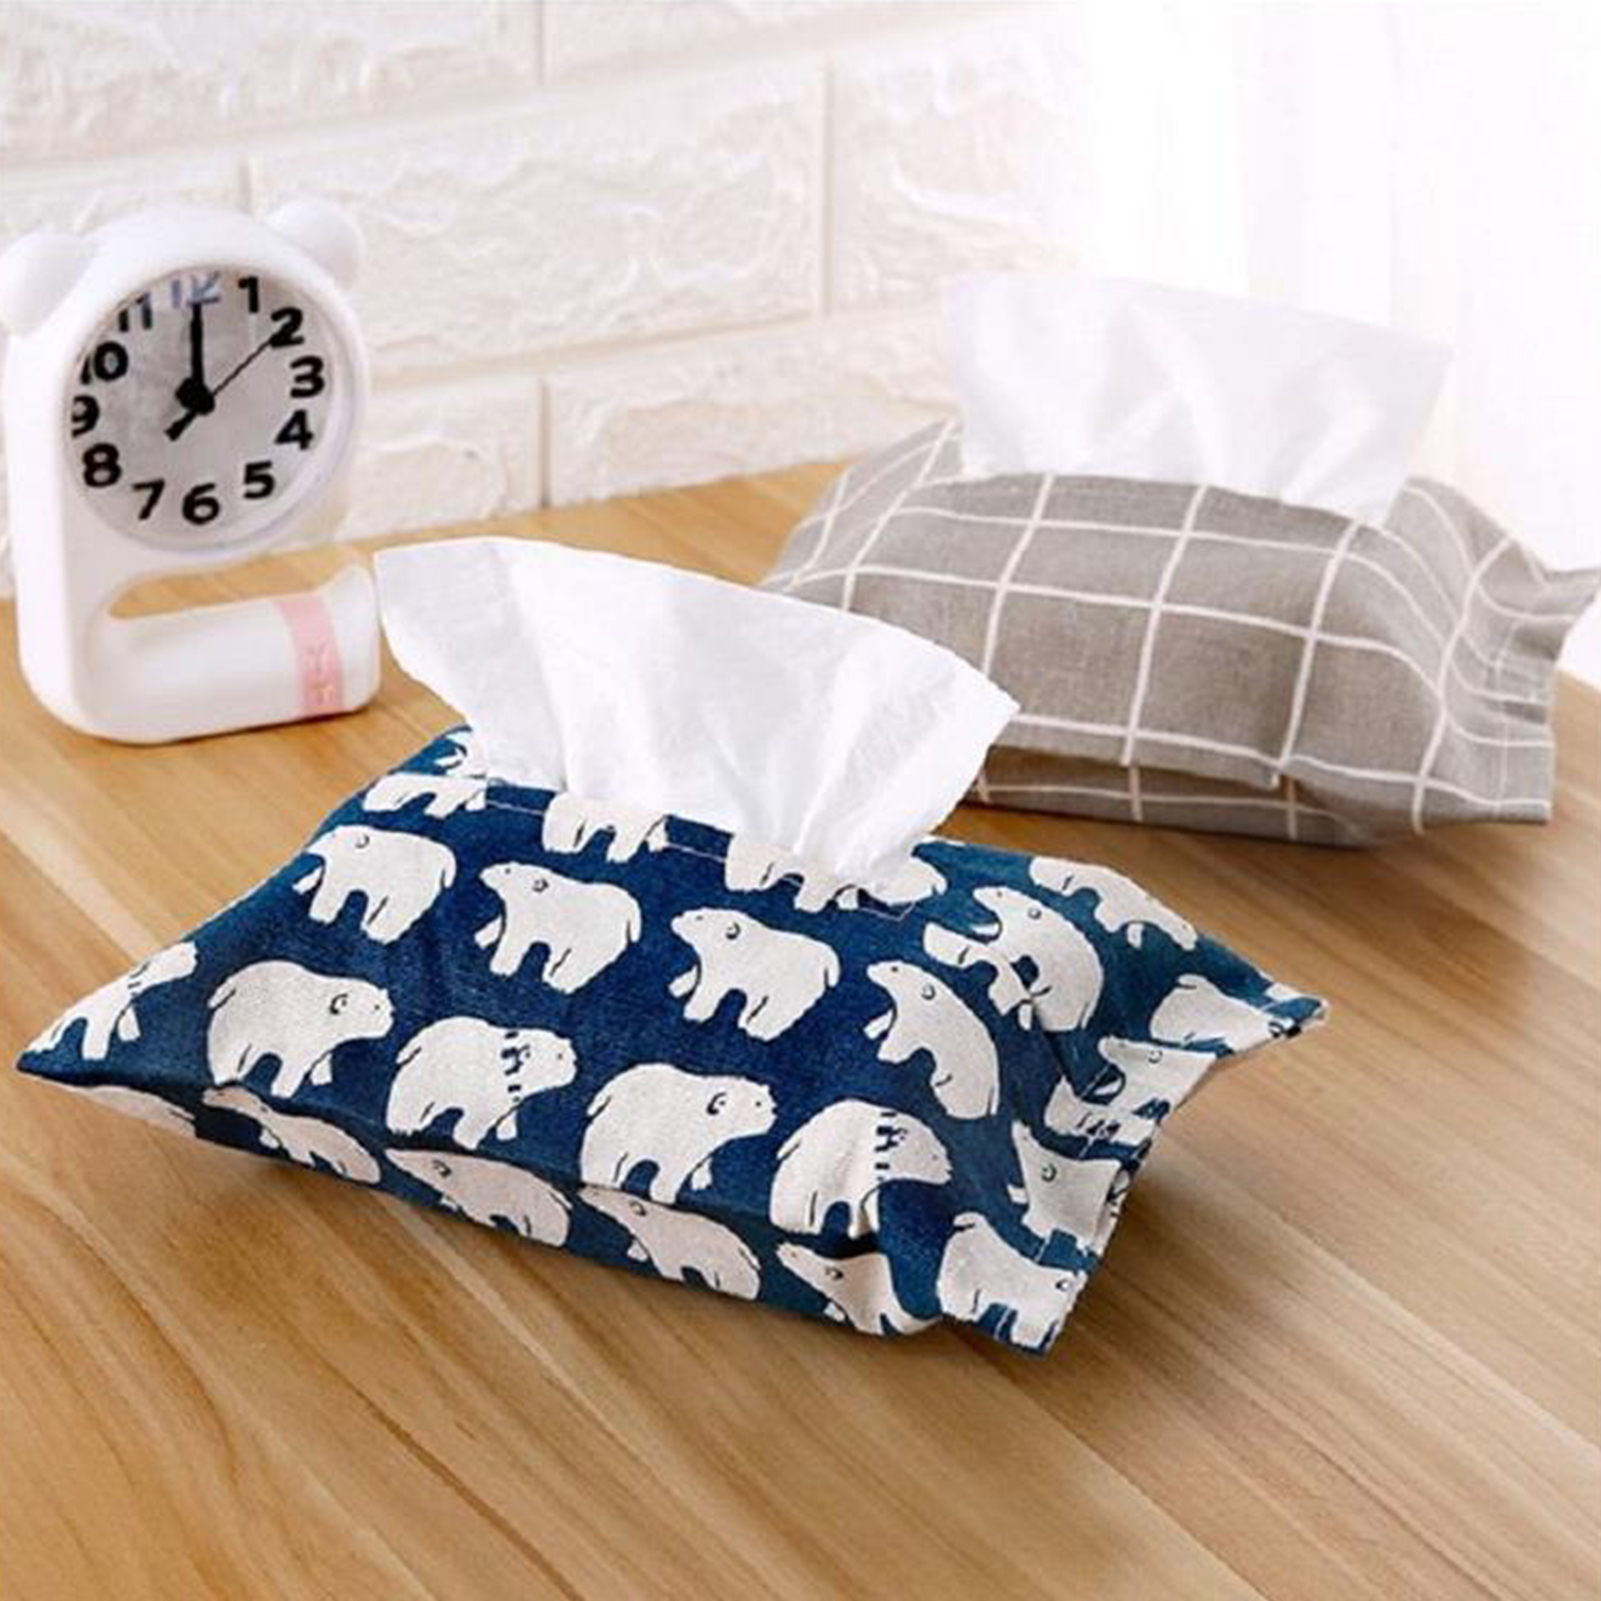 Tissue Box Bathroom Storage Organizer Bin for Toilet Paper Hand Towels Paper Napkin Holder Home Office Car Paper Towel Dispenser